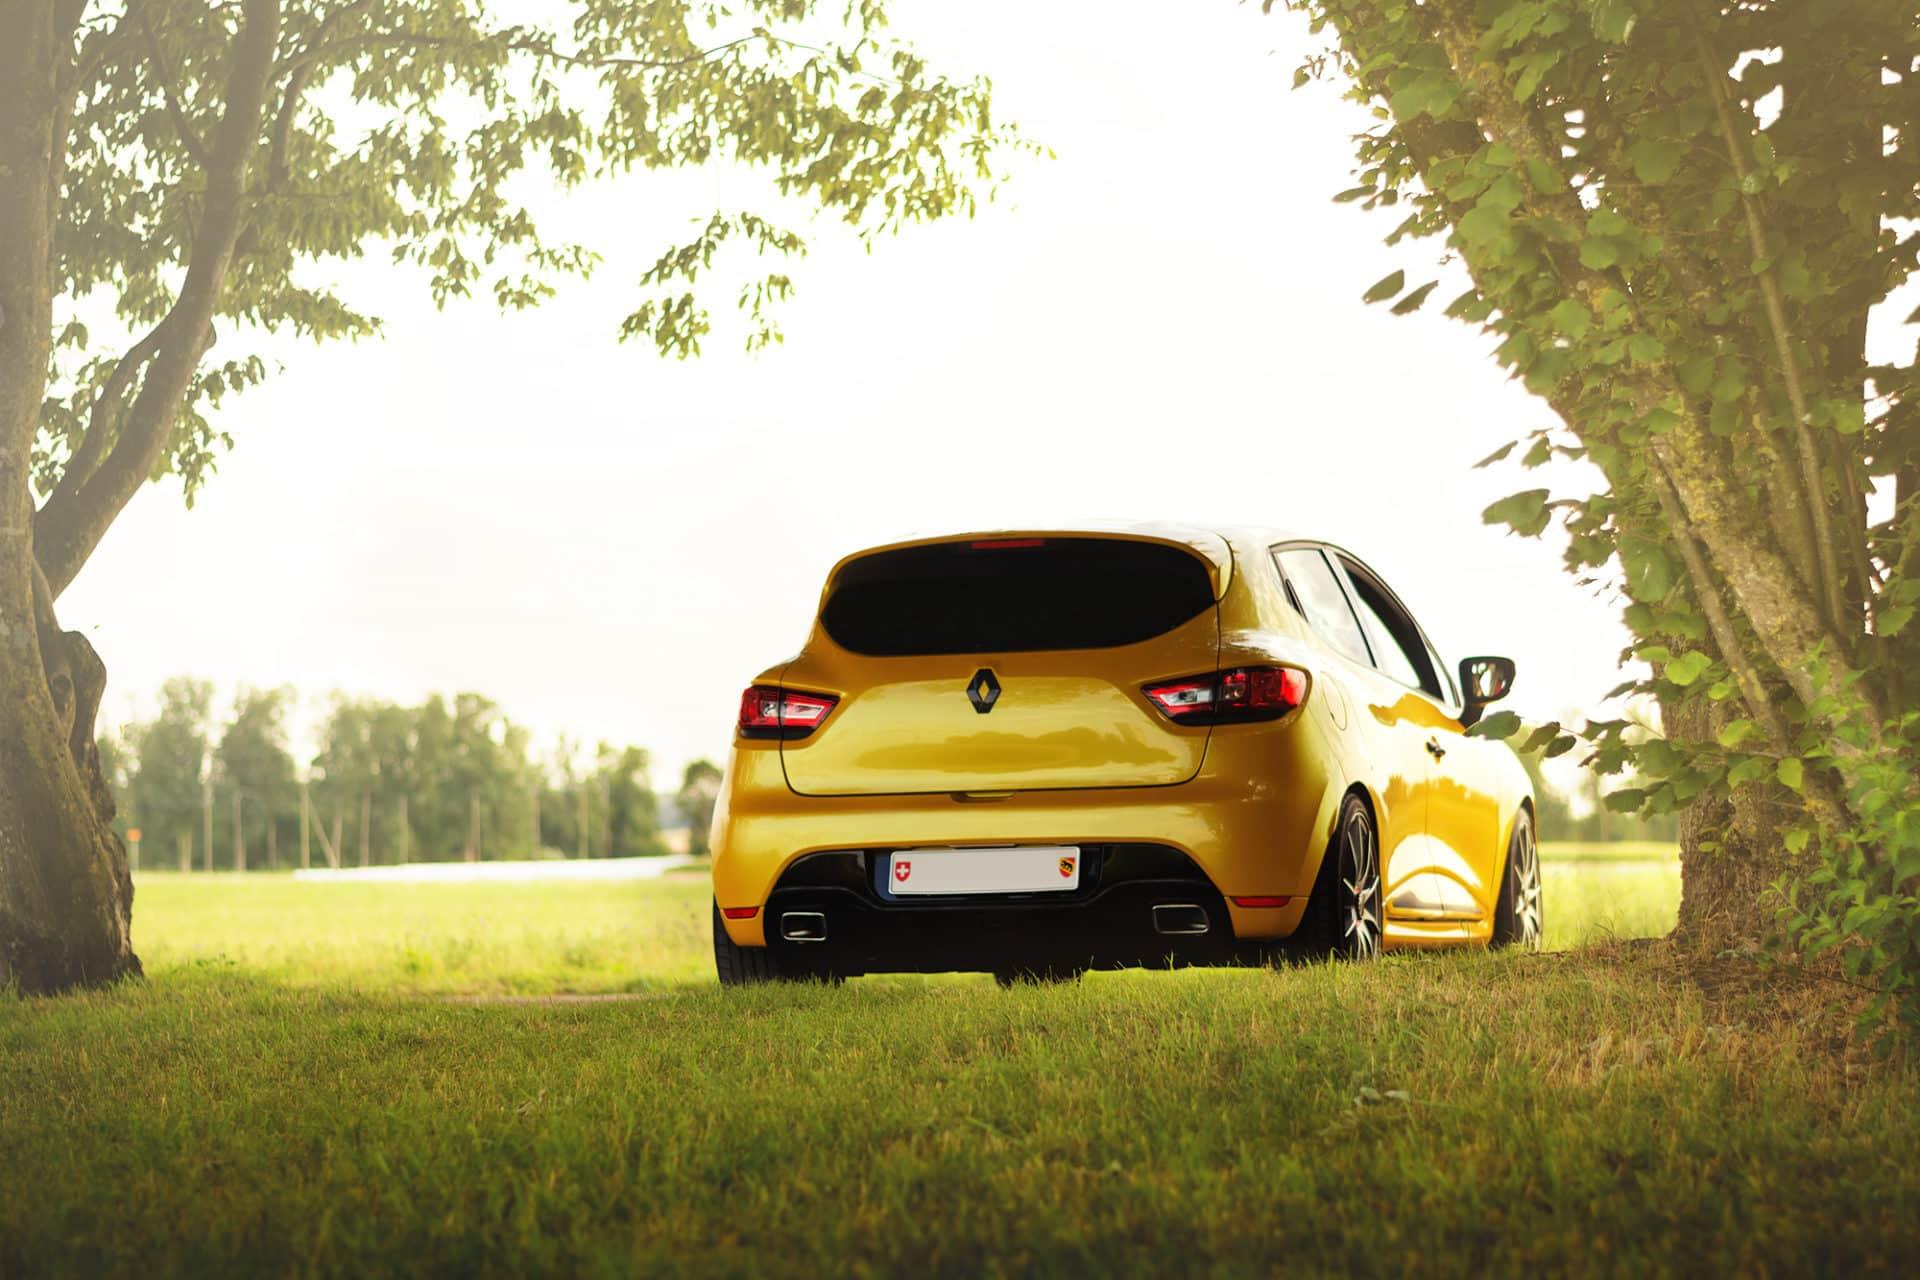 Renault Clio 4 RS 200T